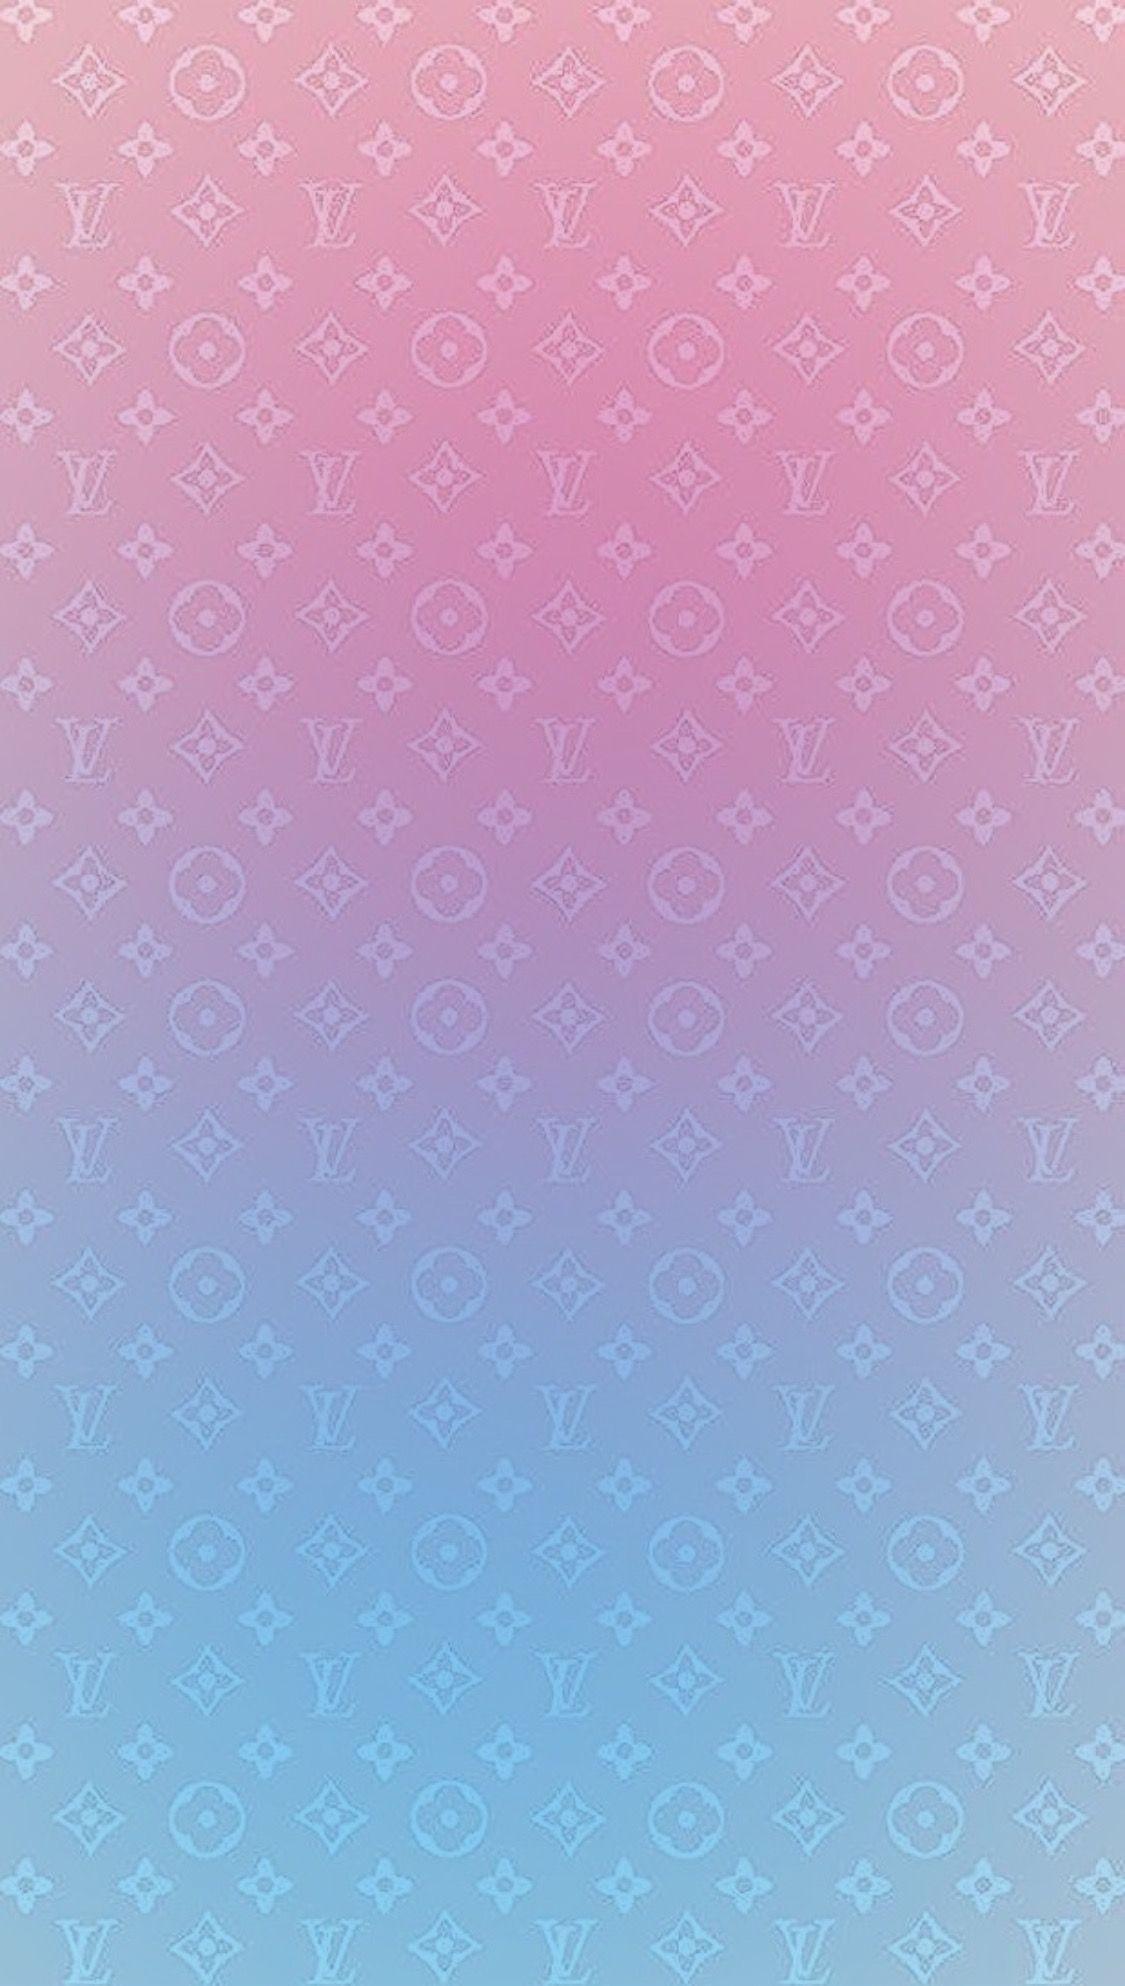 Lv Wallpaper Pink Ombre Wallpaper Ombre Wallpaper Iphone Purple Ombre Wallpaper